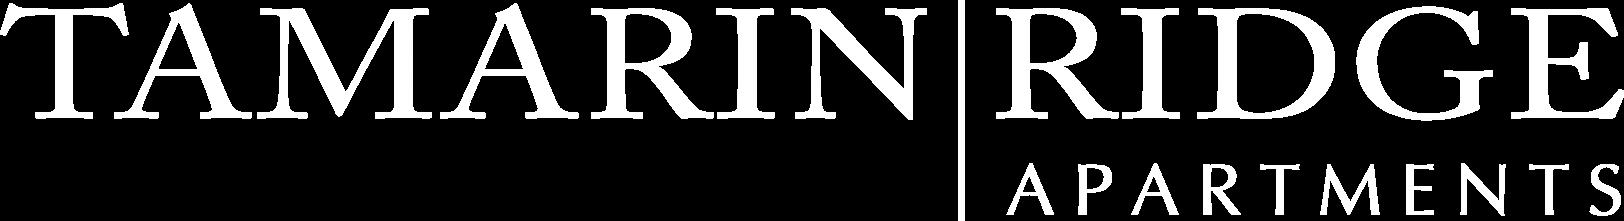 Lincoln Property Logo 2